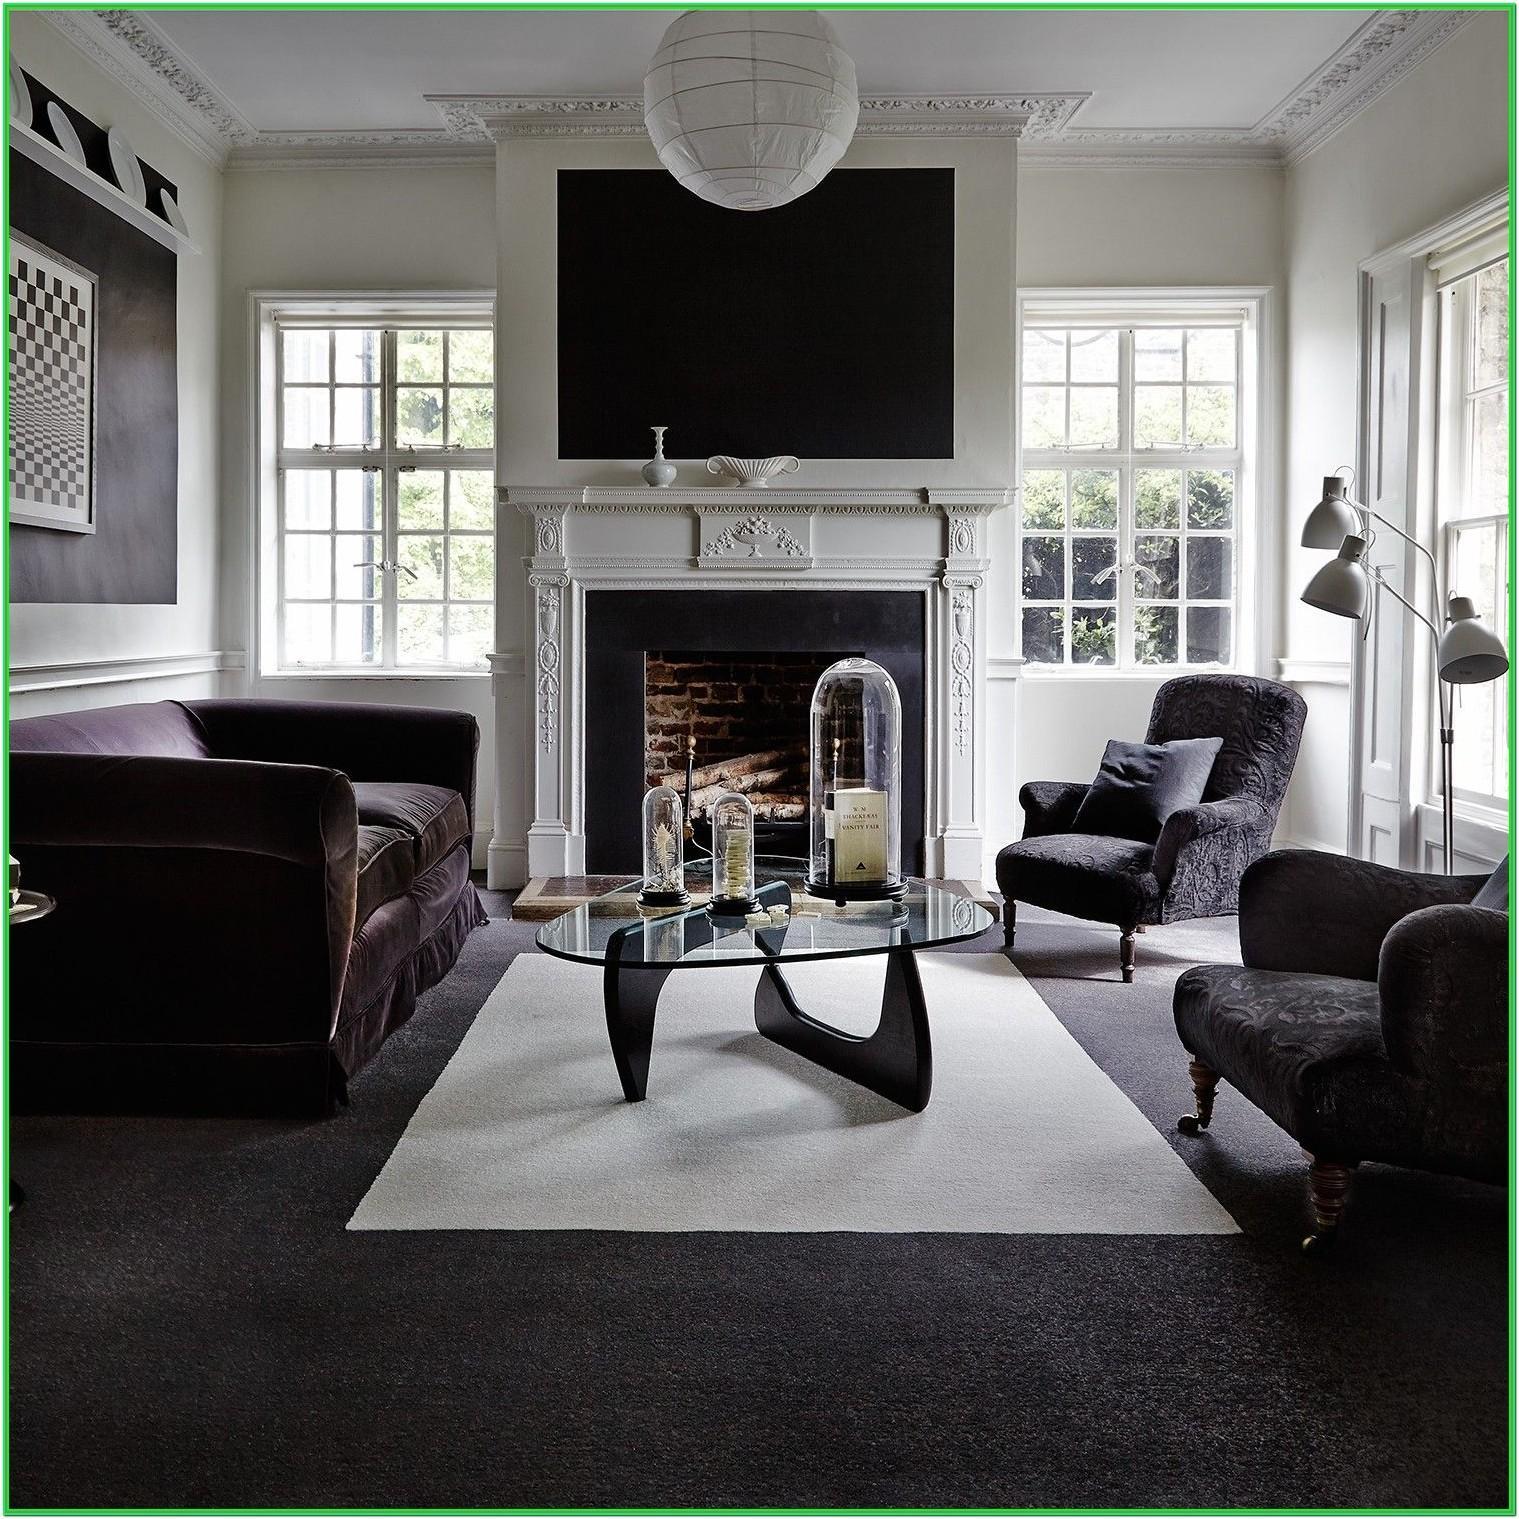 Living Room Black Wall To Wall Carpet